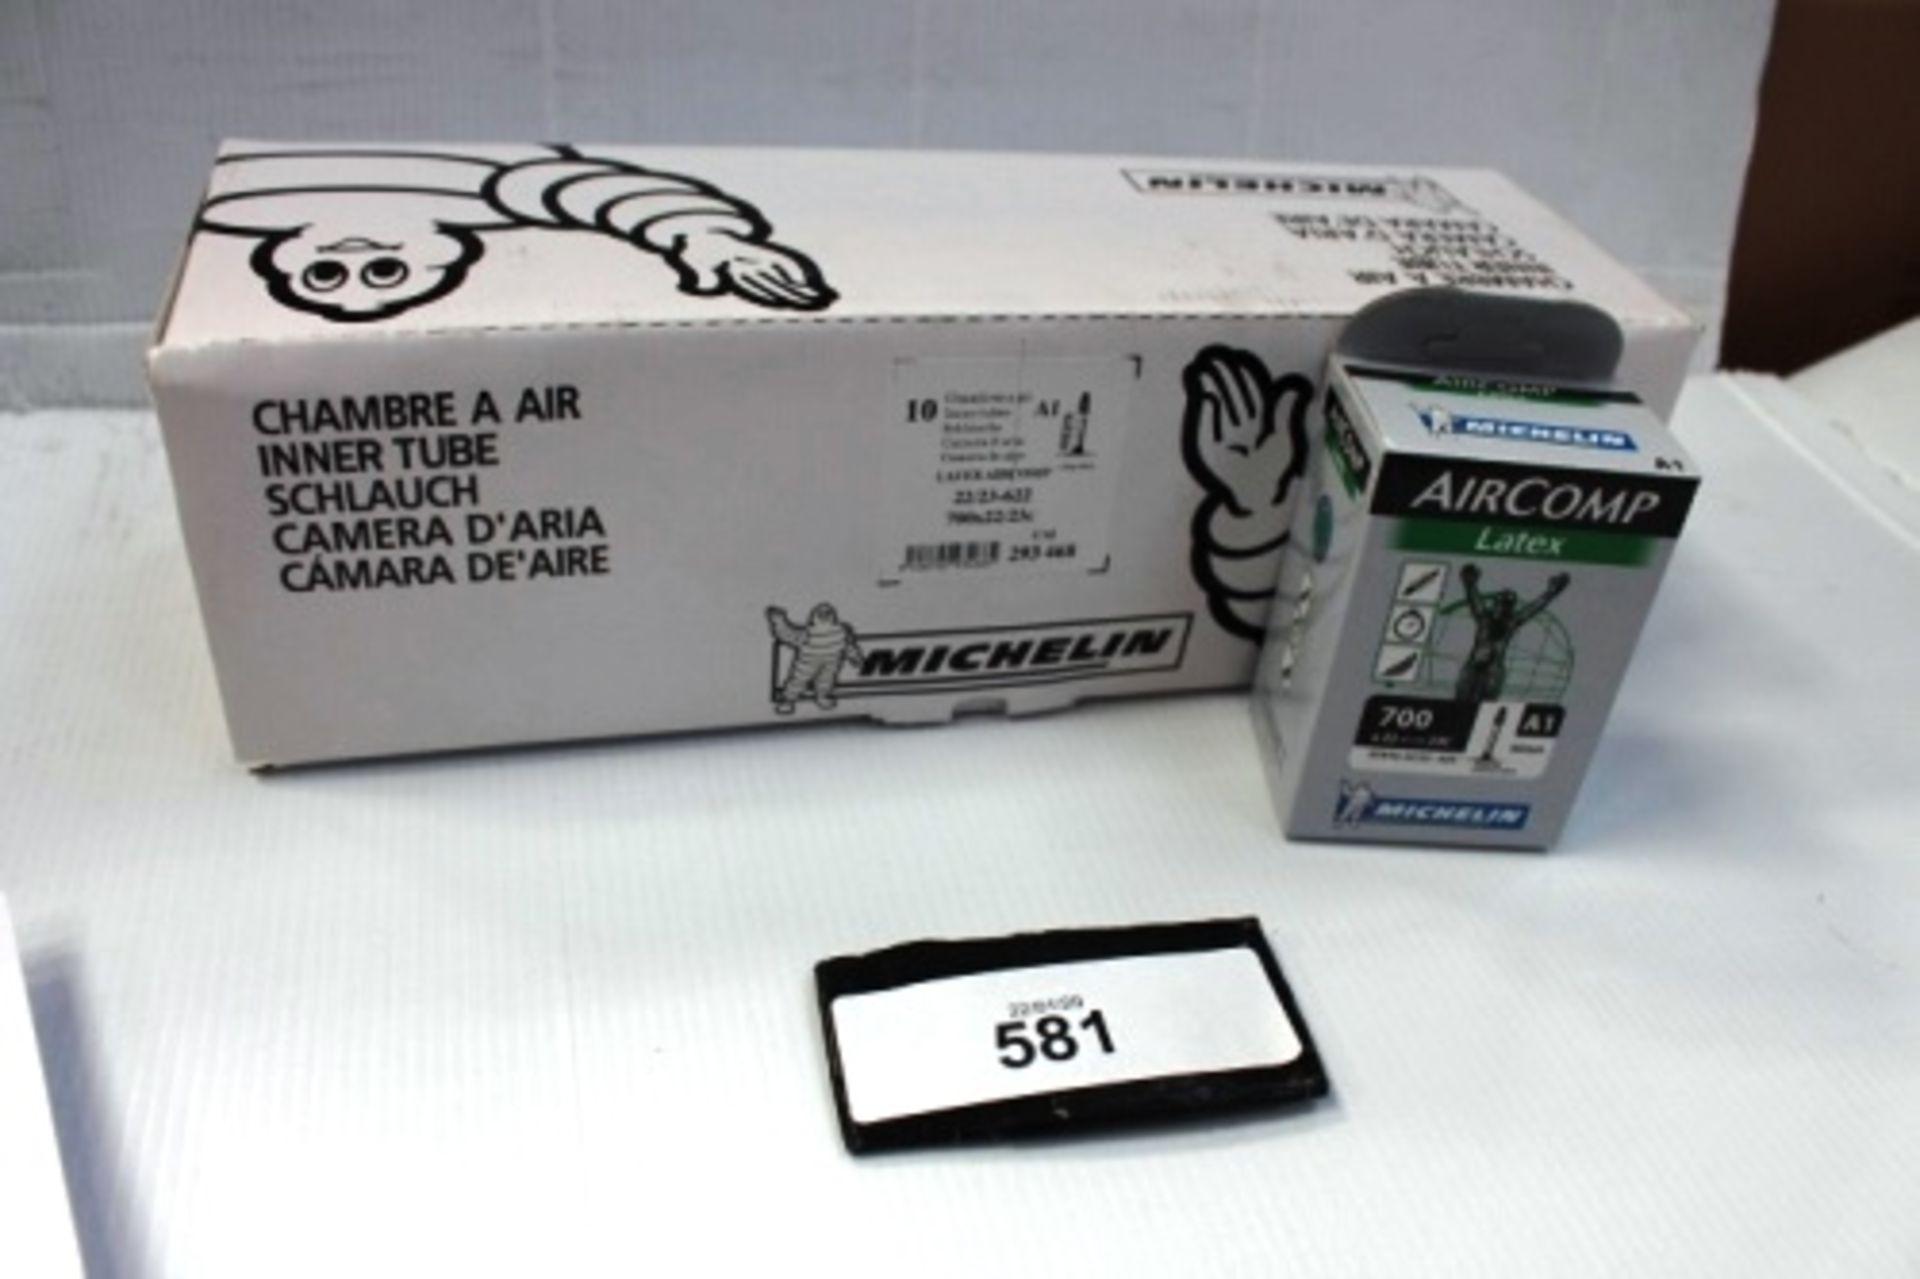 Lot 581 - 10 x Michelin Air Comp Latex 60mm 700 x 22/23C inner tubes - New in box (ES13)